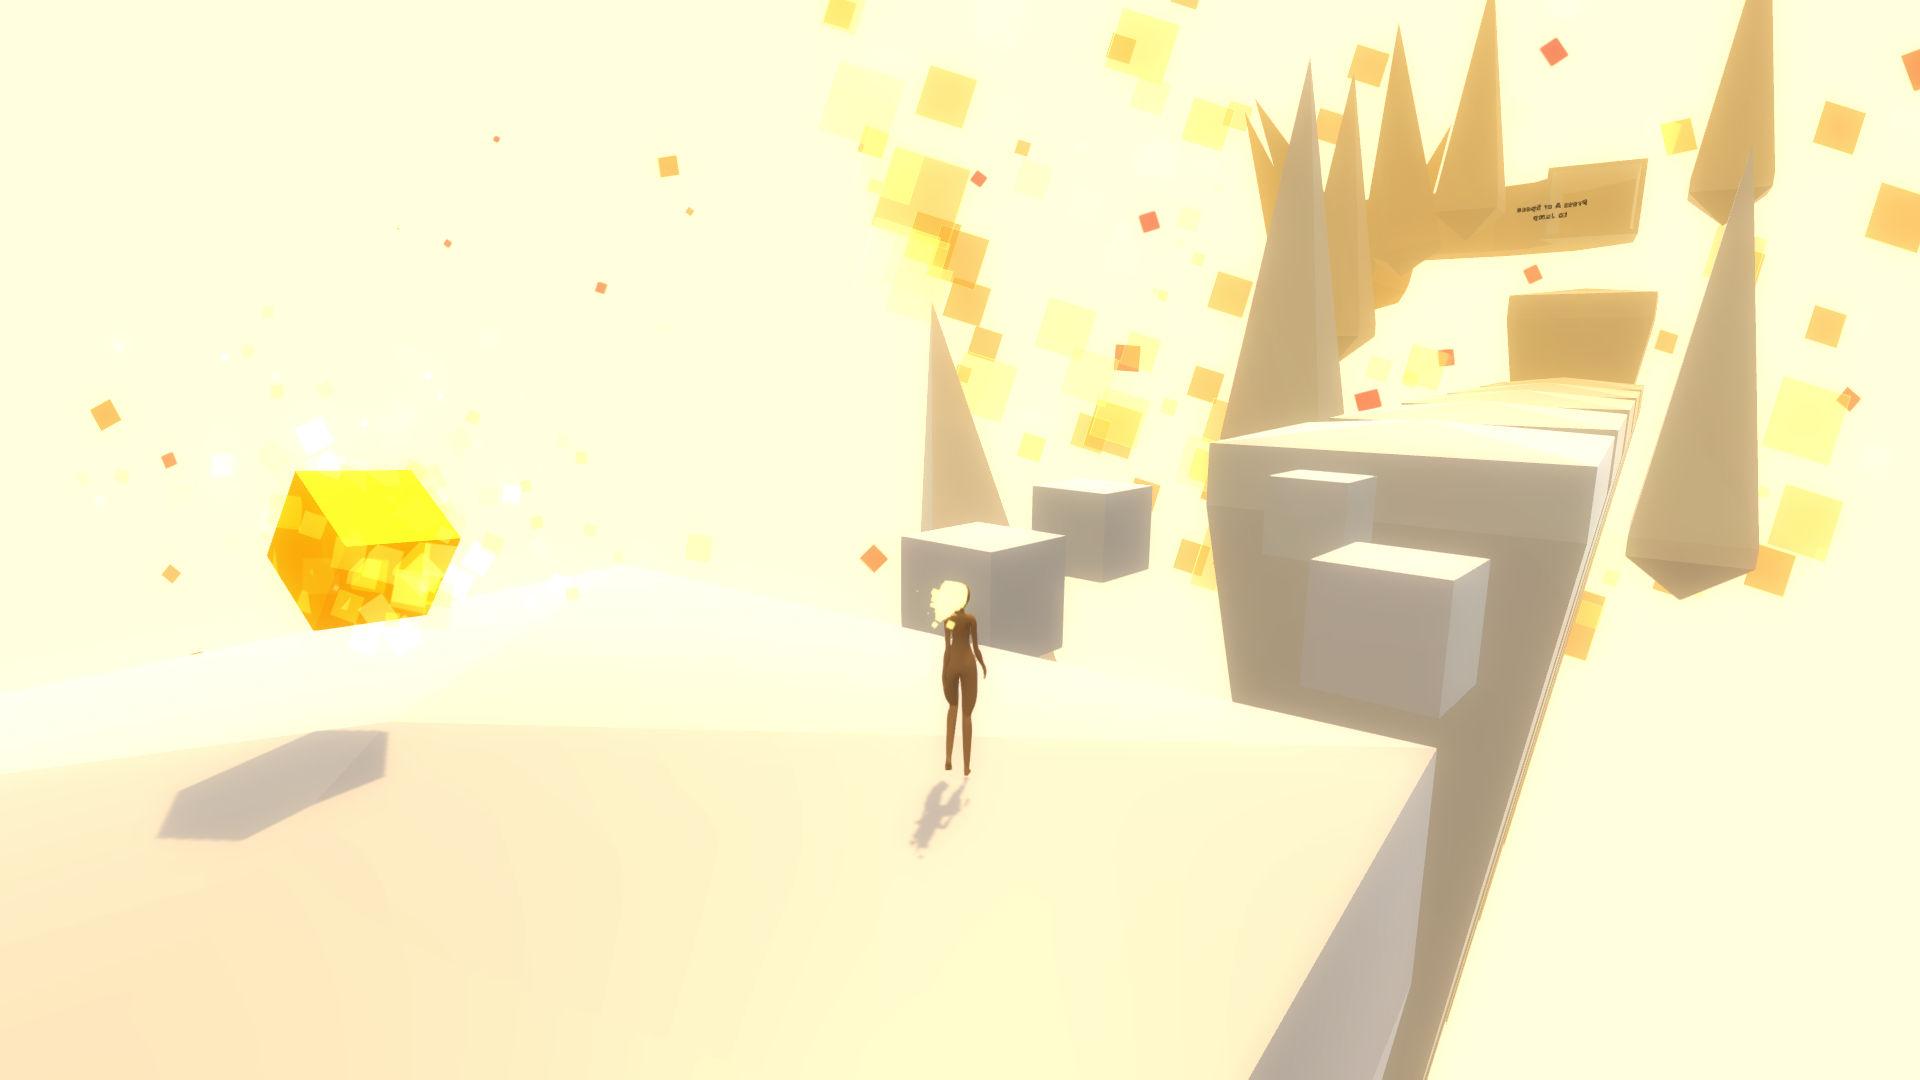 preview level screenshot